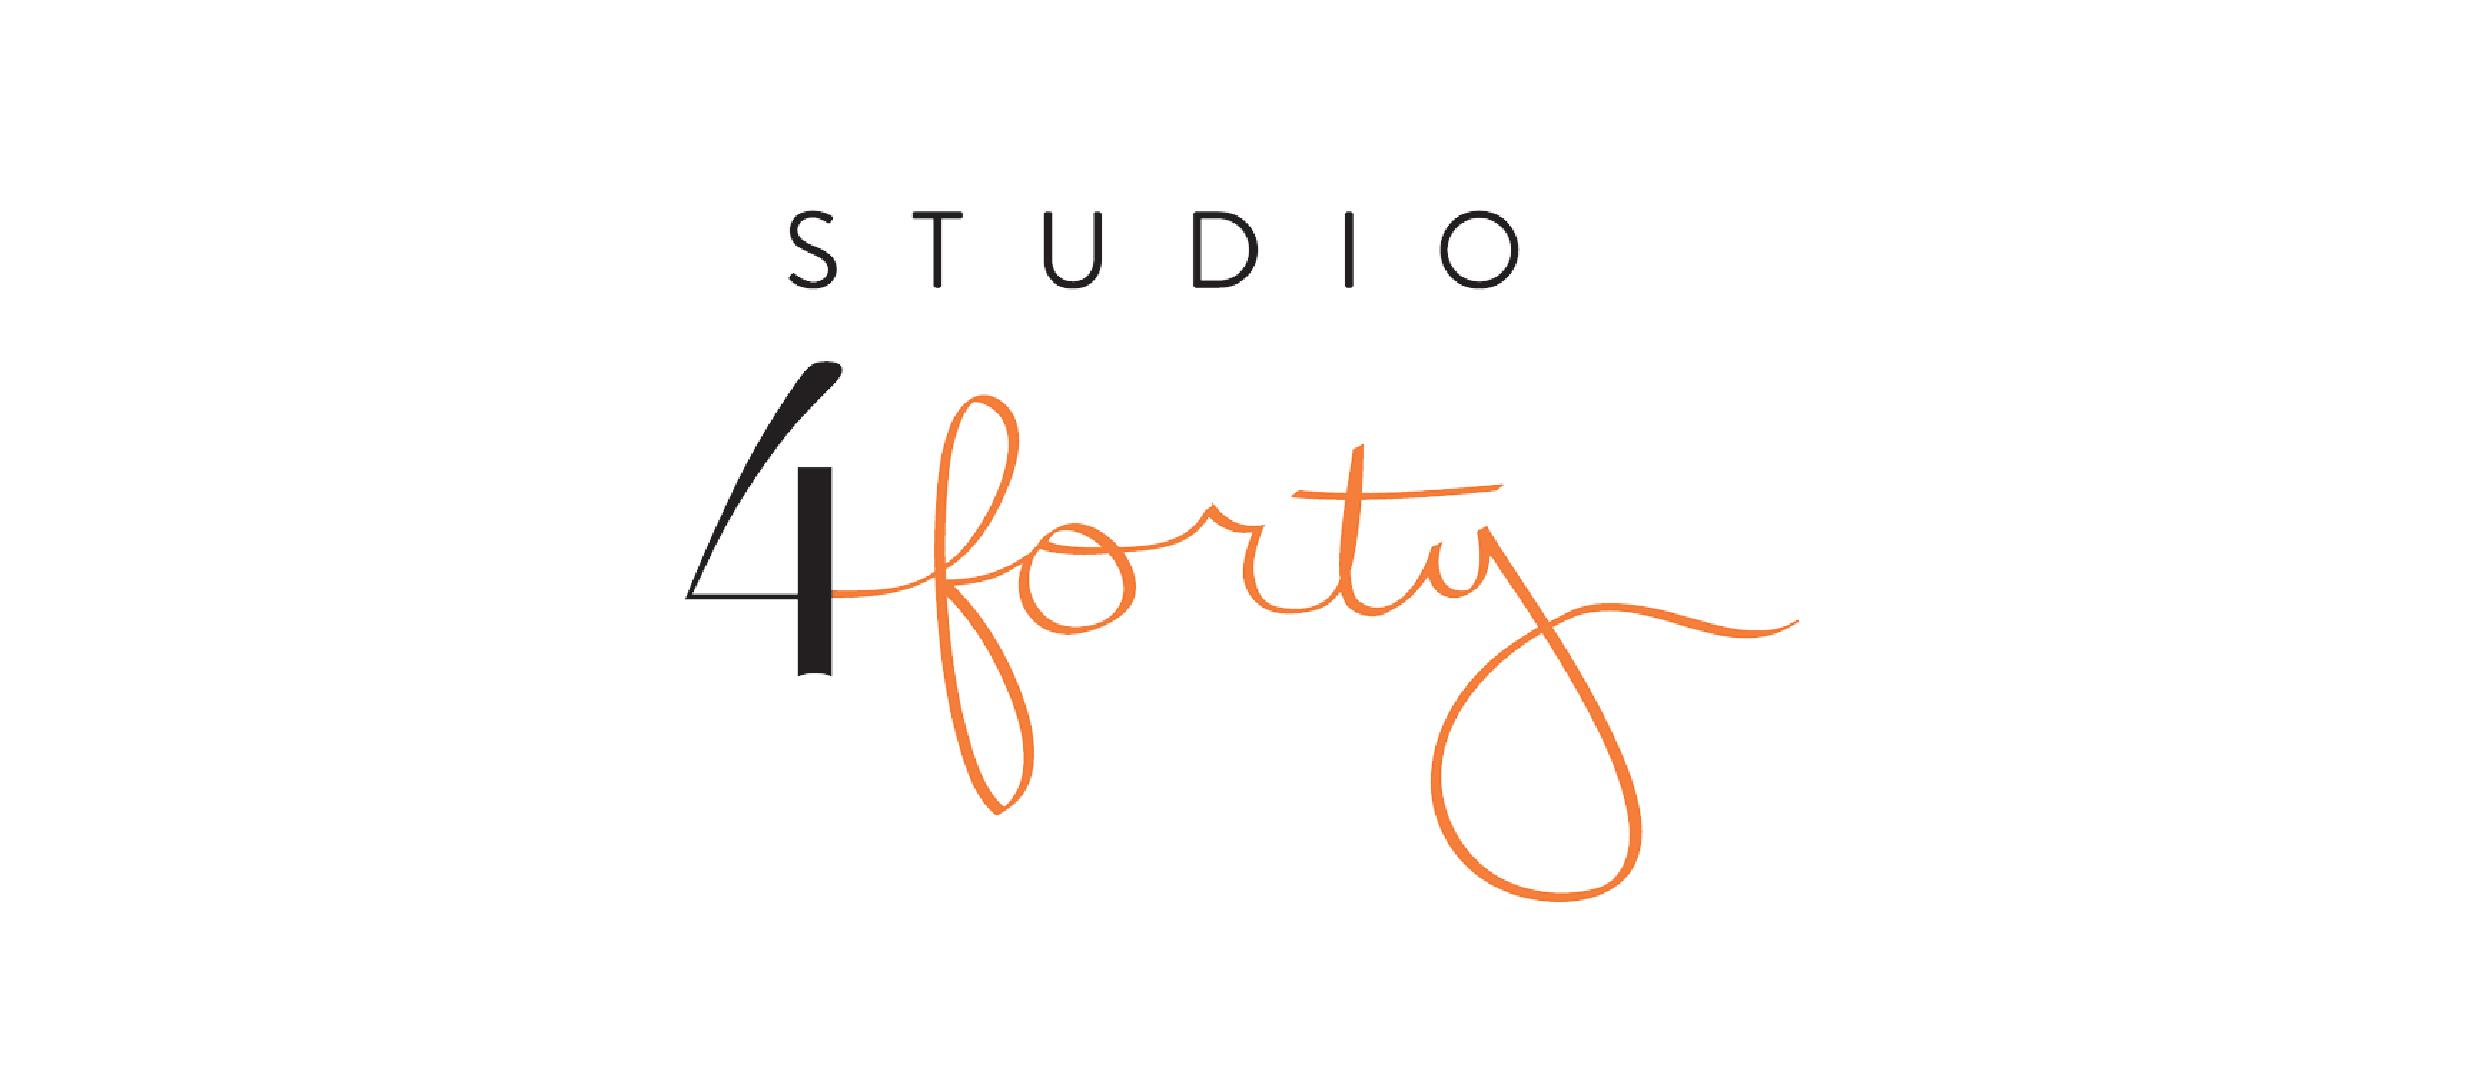 Studio 4Forty